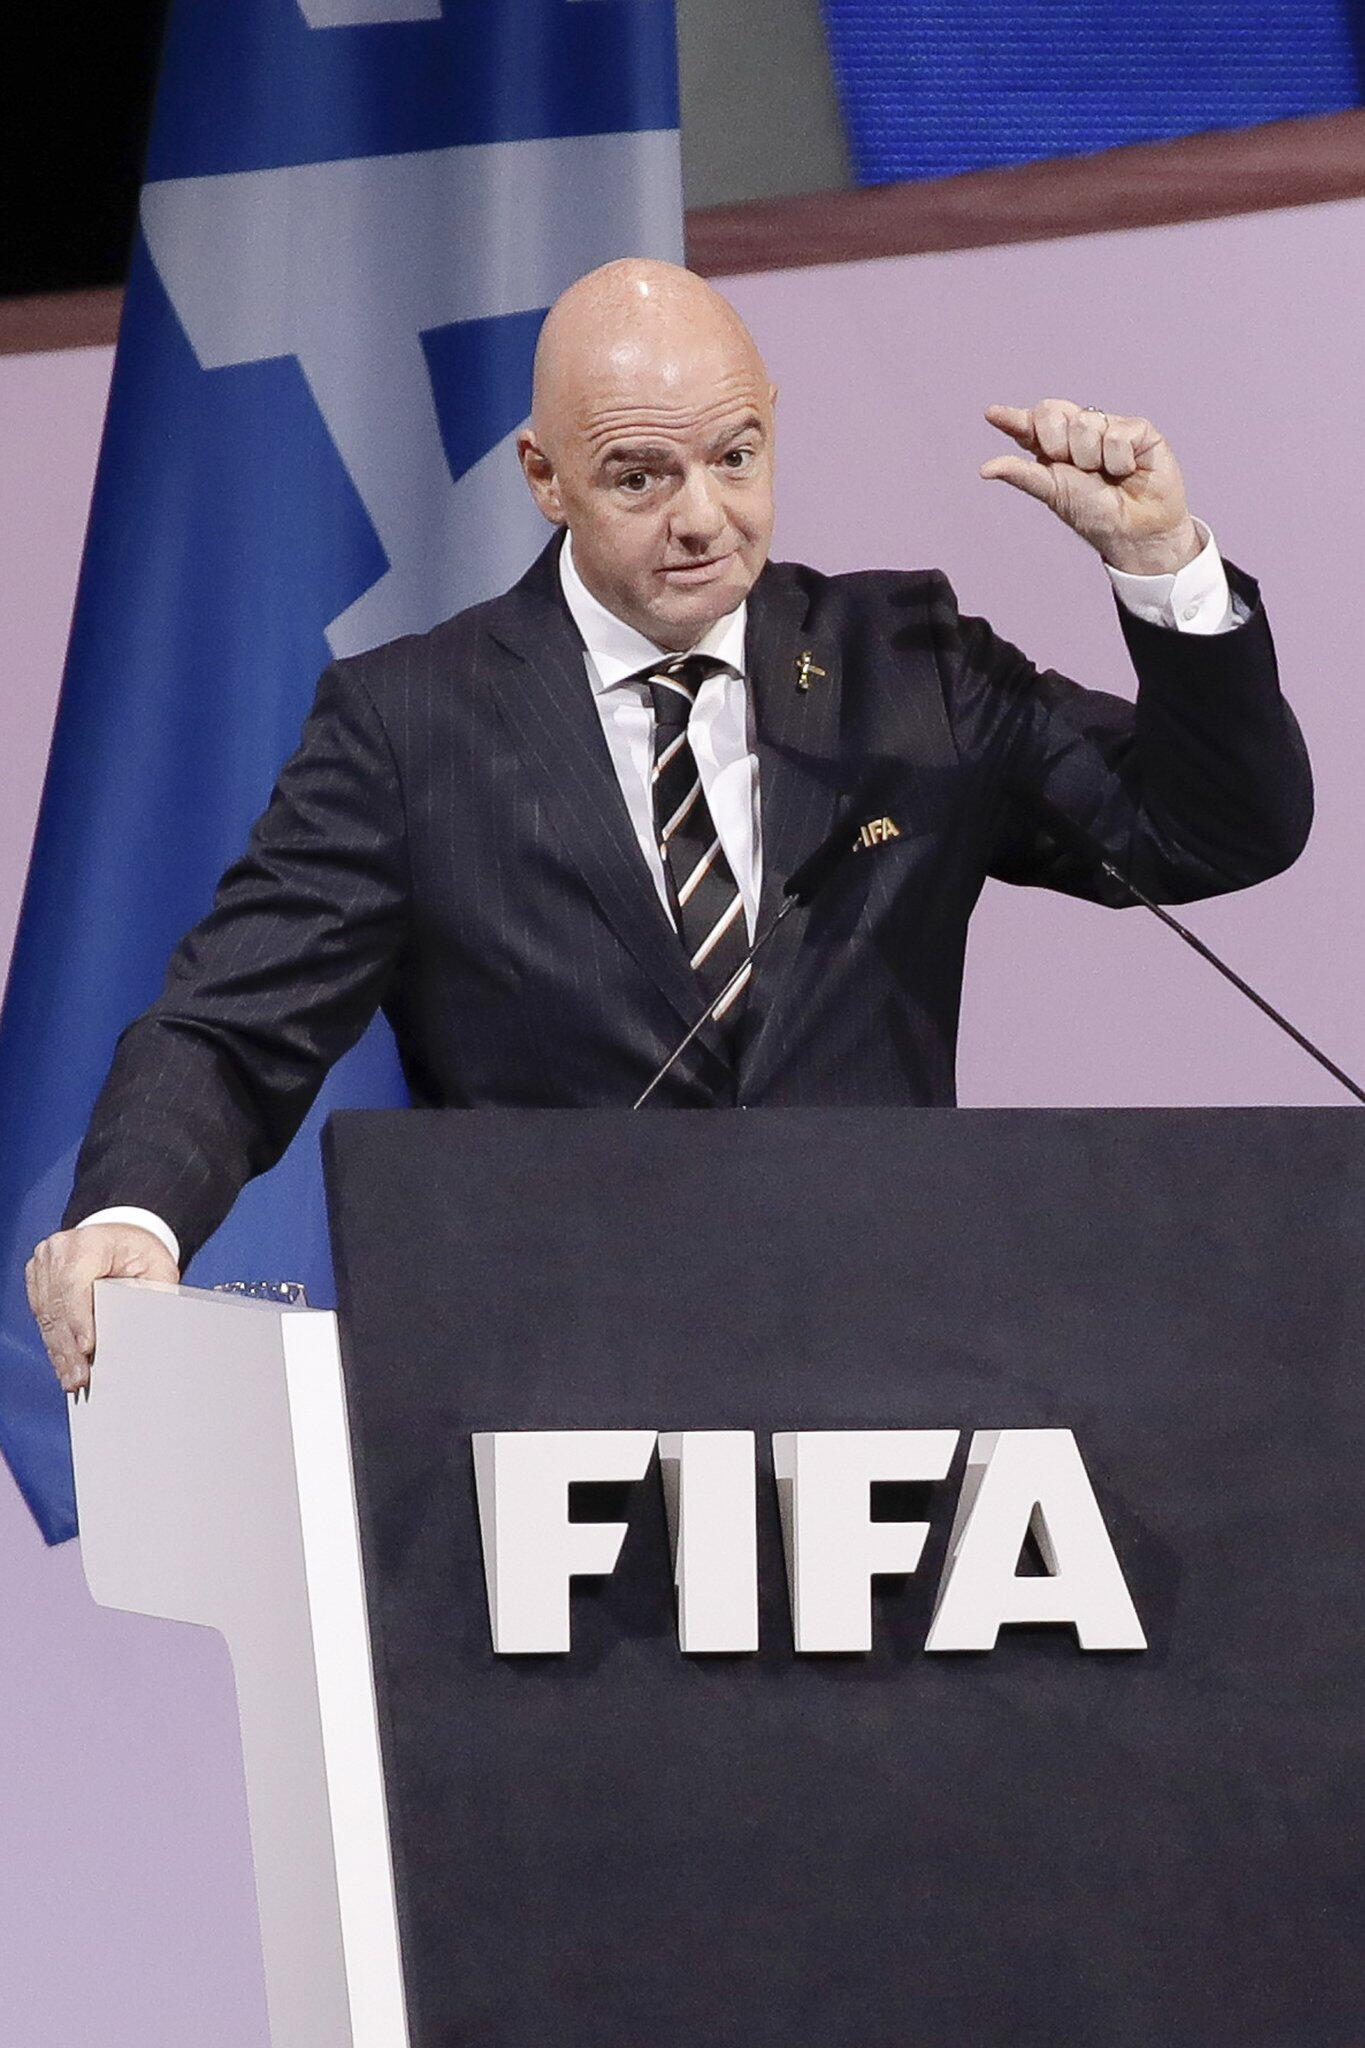 Bild zu FIFA, Kongress, Wahl, Präsident, Gianni Infantino